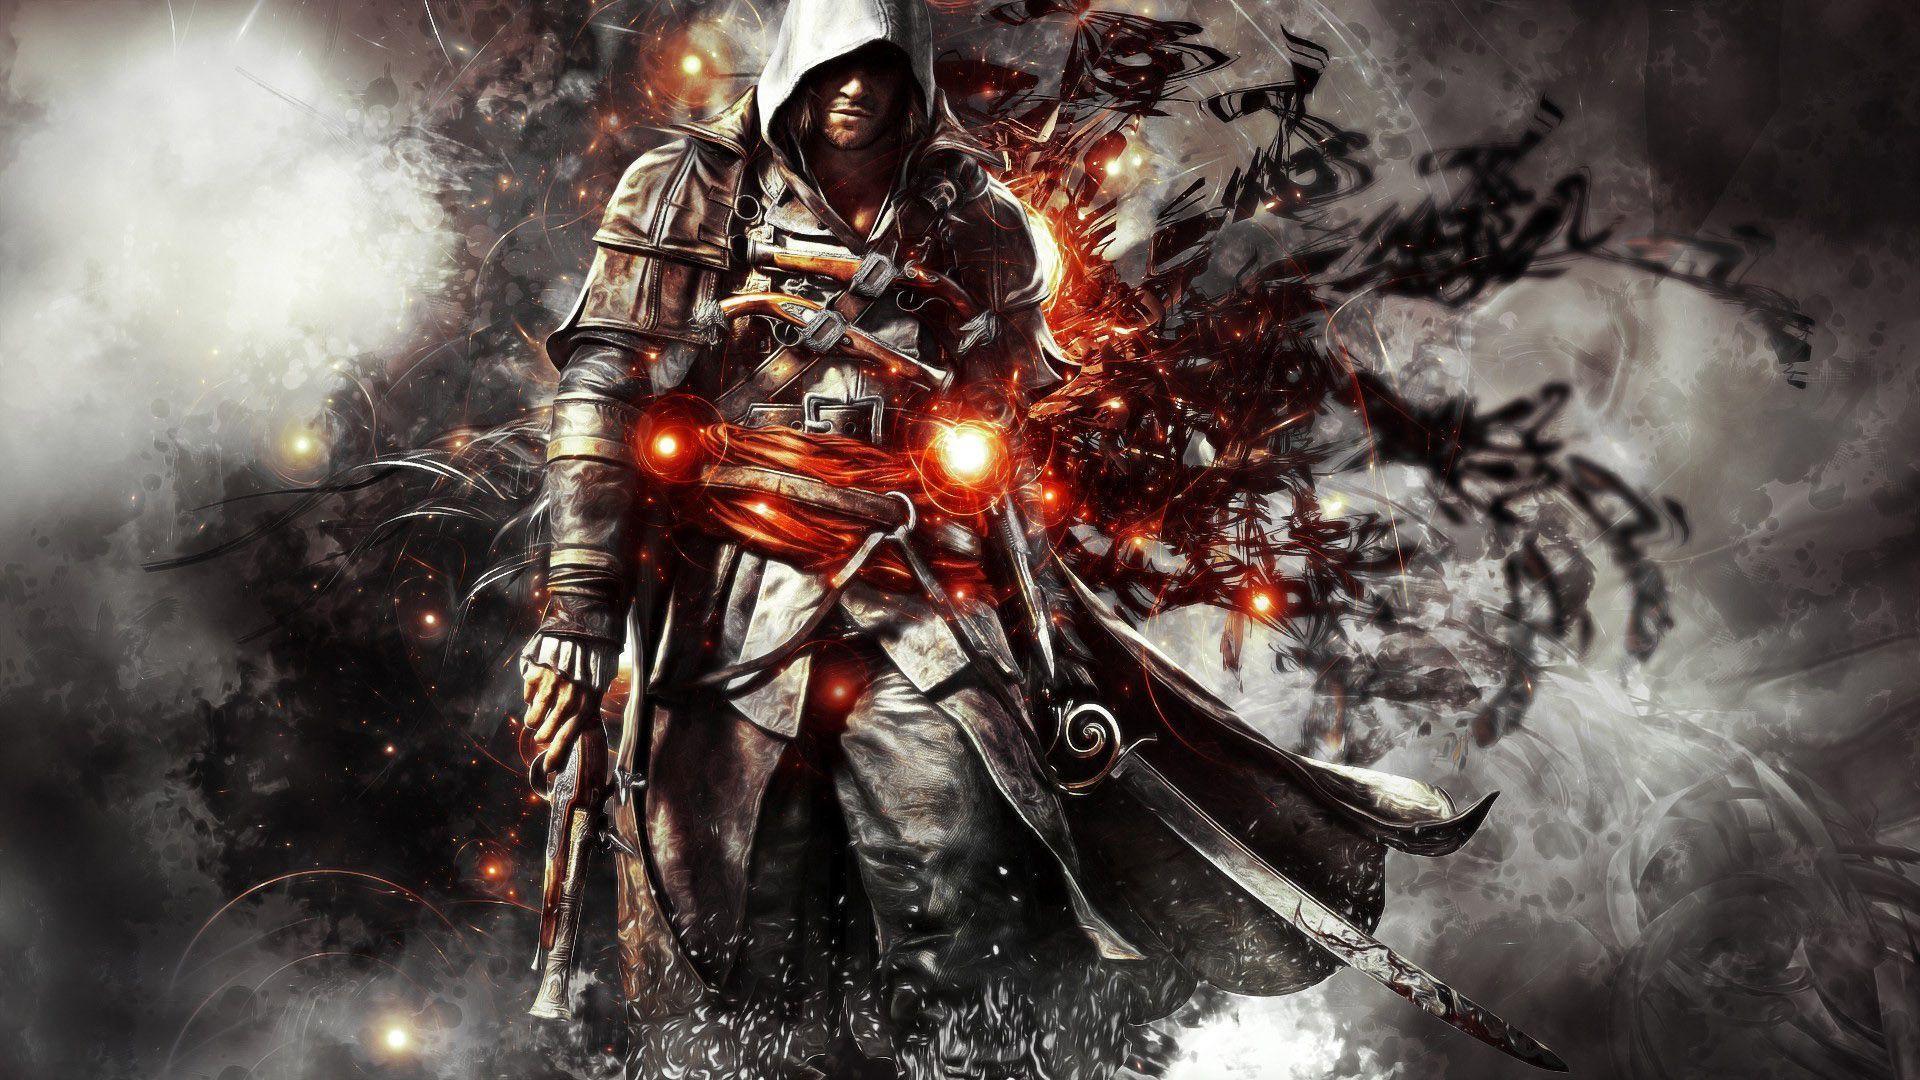 Assassin's Creed Desktop Backgrounds - Wallpaper Cave